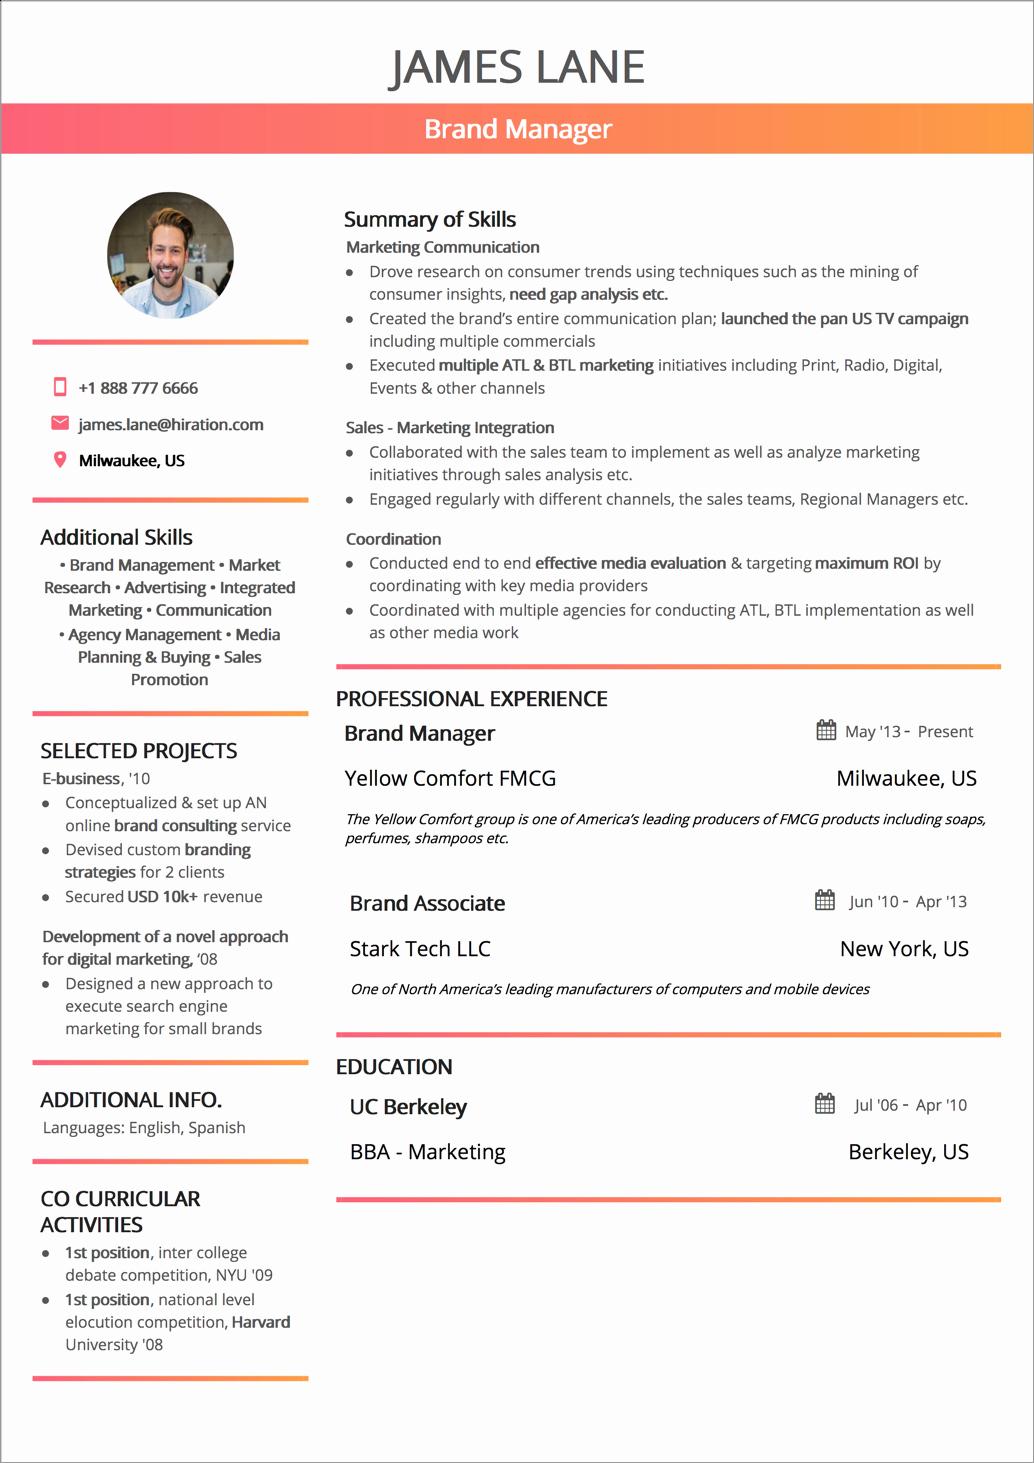 Free Functional Resume Template 2018 Elegant Functional Resume the 2018 Guide to Functional Resumes